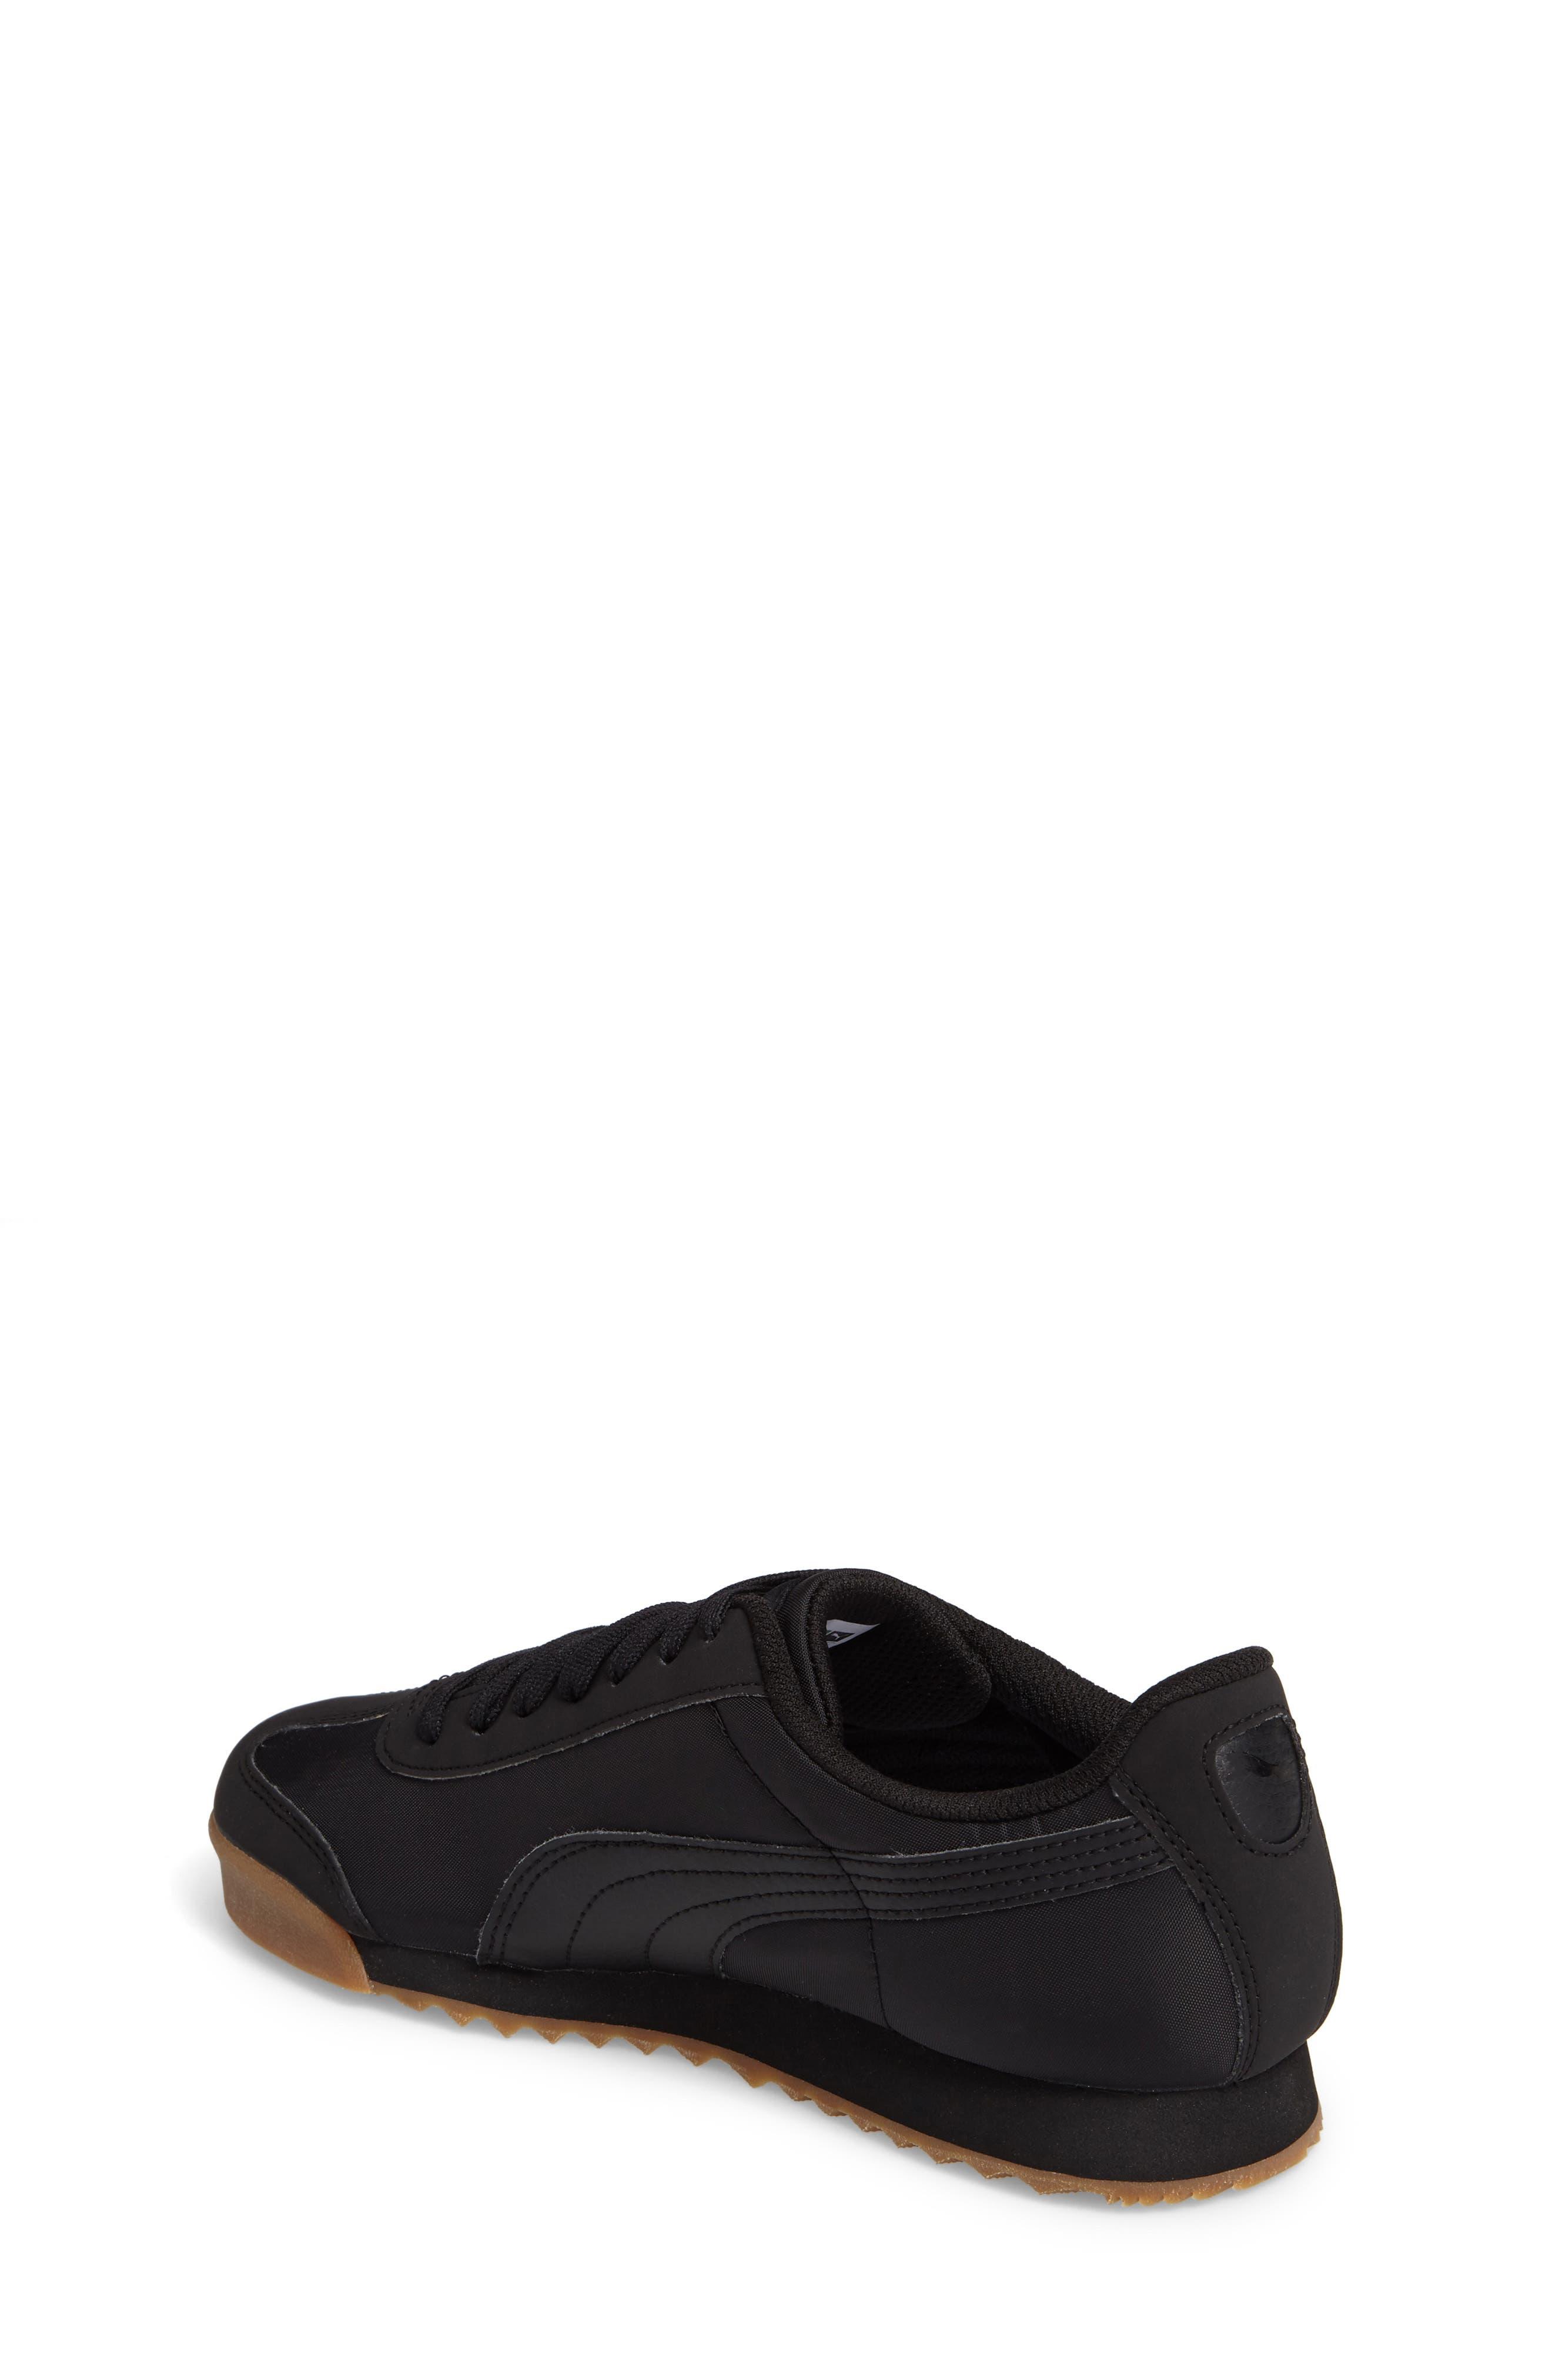 PUMA,                             Roma Basic Summer Sneaker,                             Alternate thumbnail 2, color,                             001